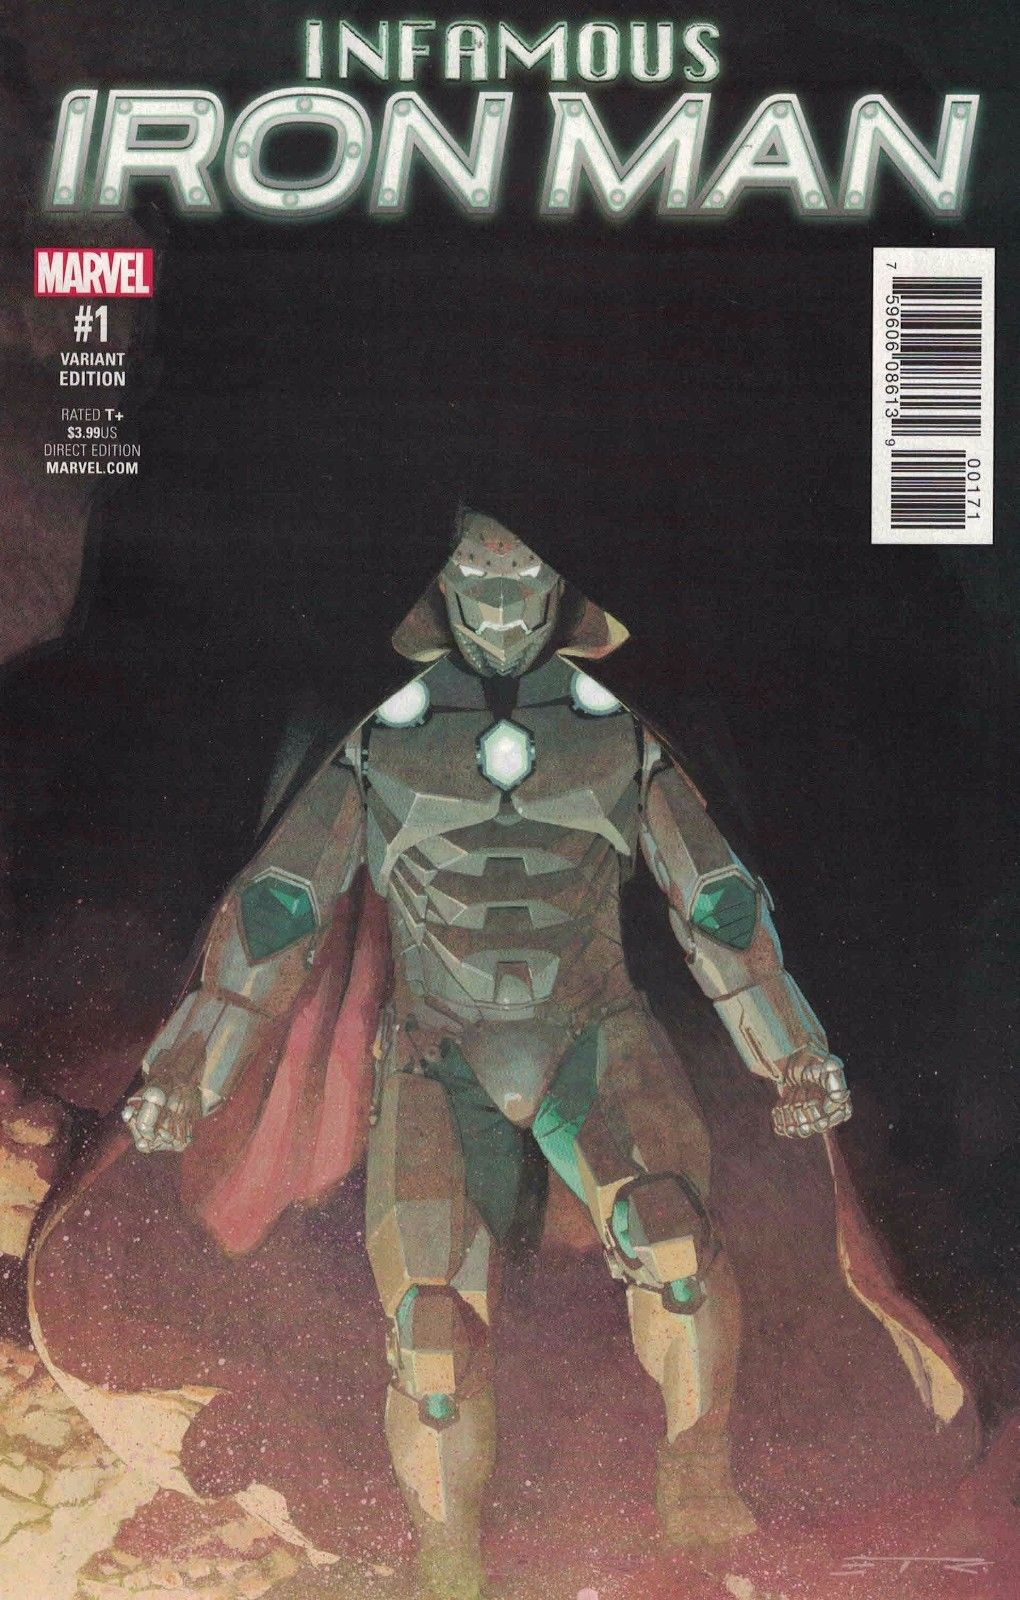 Infamous-Iron-Man-1-125-Esad-Ribic-Variant-NOW-Marvel-2016-Doctor-Doom-311724397728.jpg